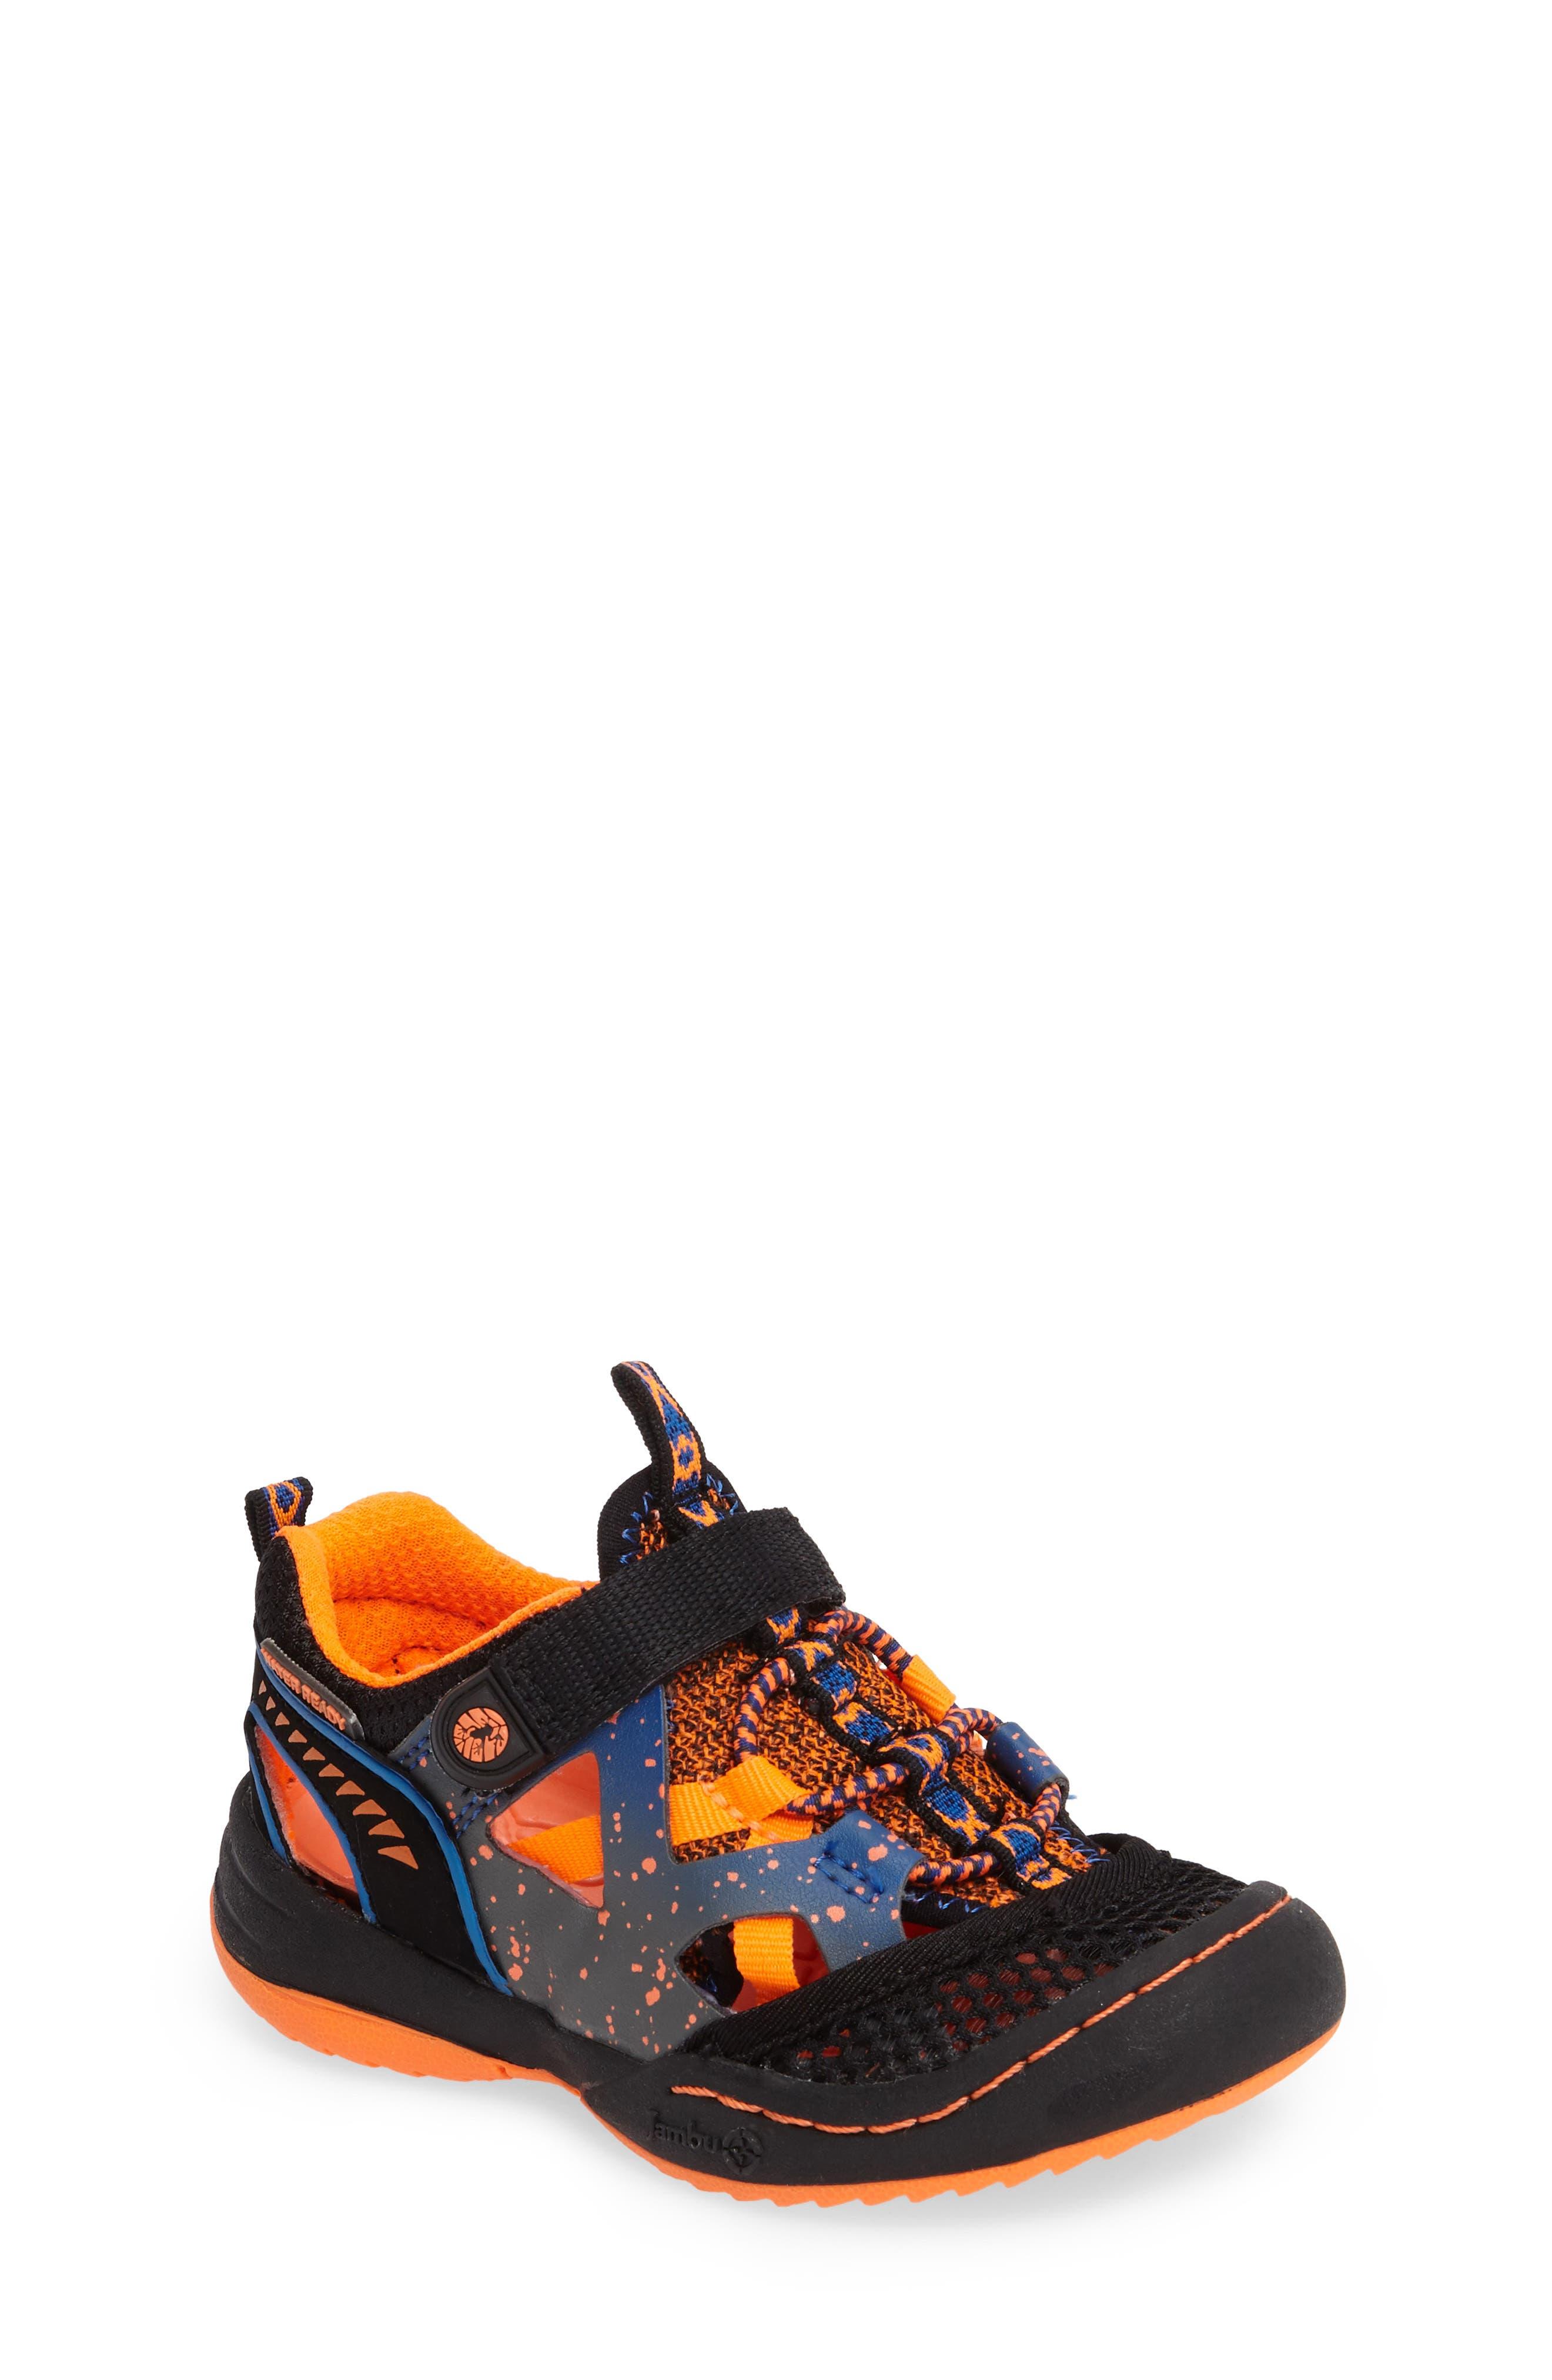 Squamata Sport Sneaker,                             Main thumbnail 1, color,                             001